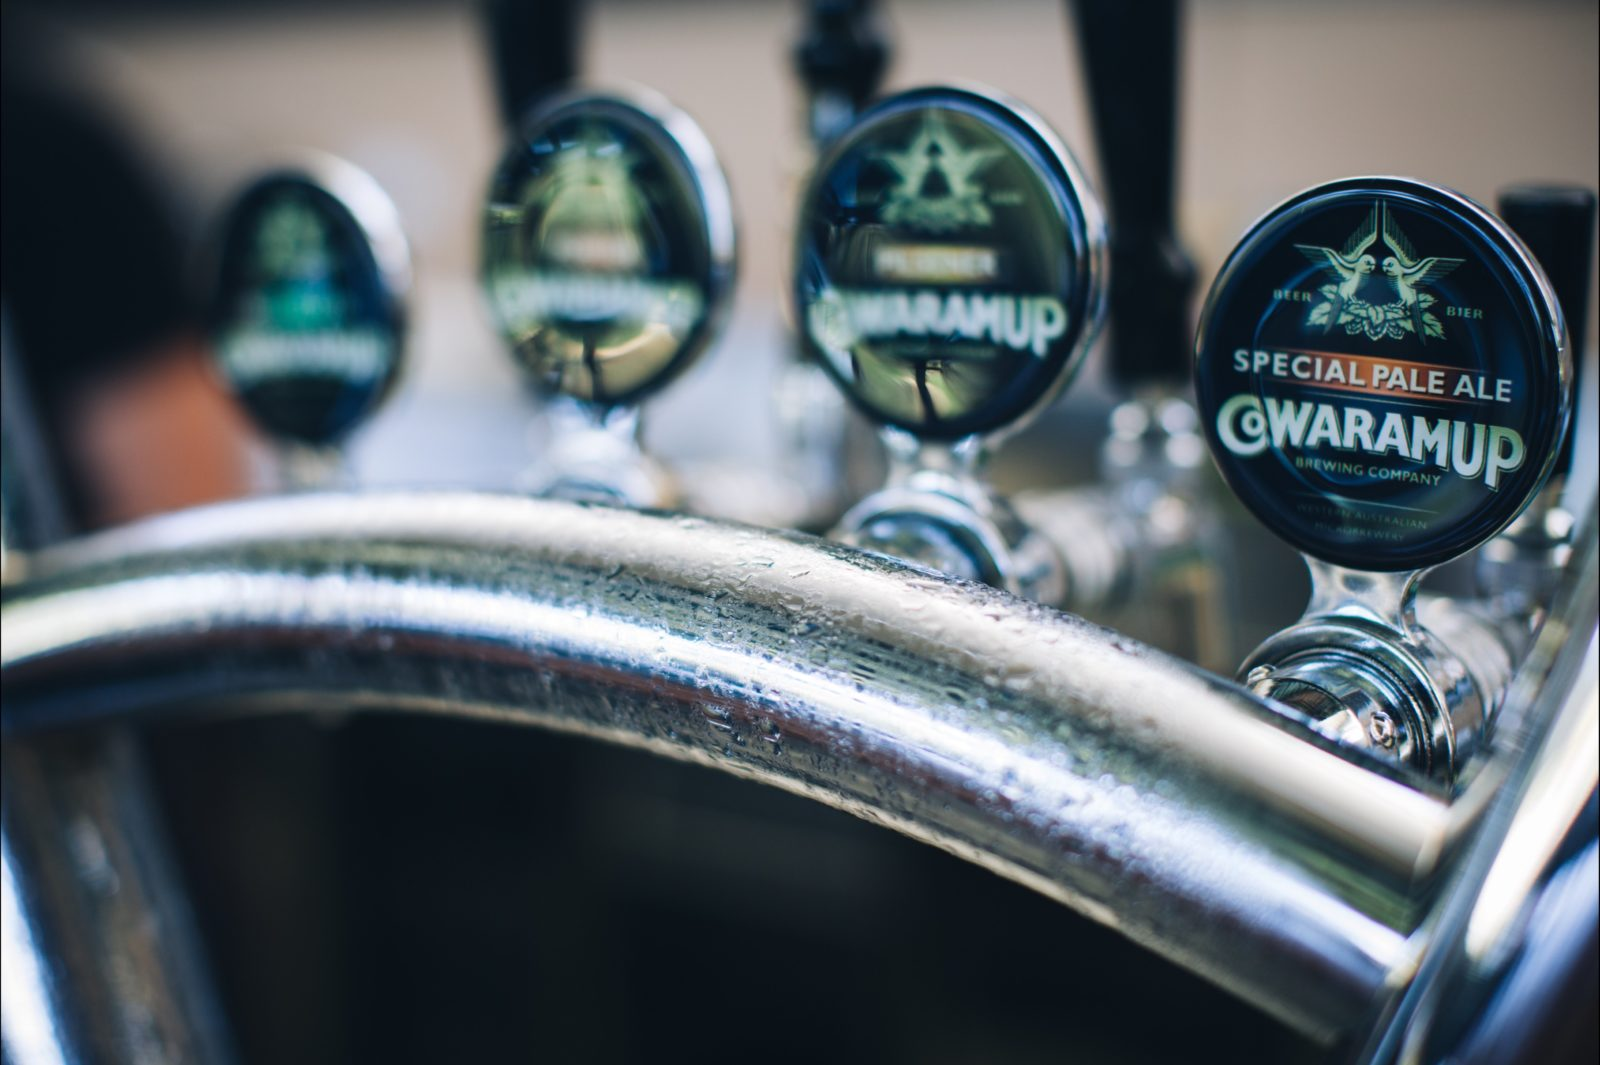 Cowaramup Brewing Company, Cowaramup, Western Australia